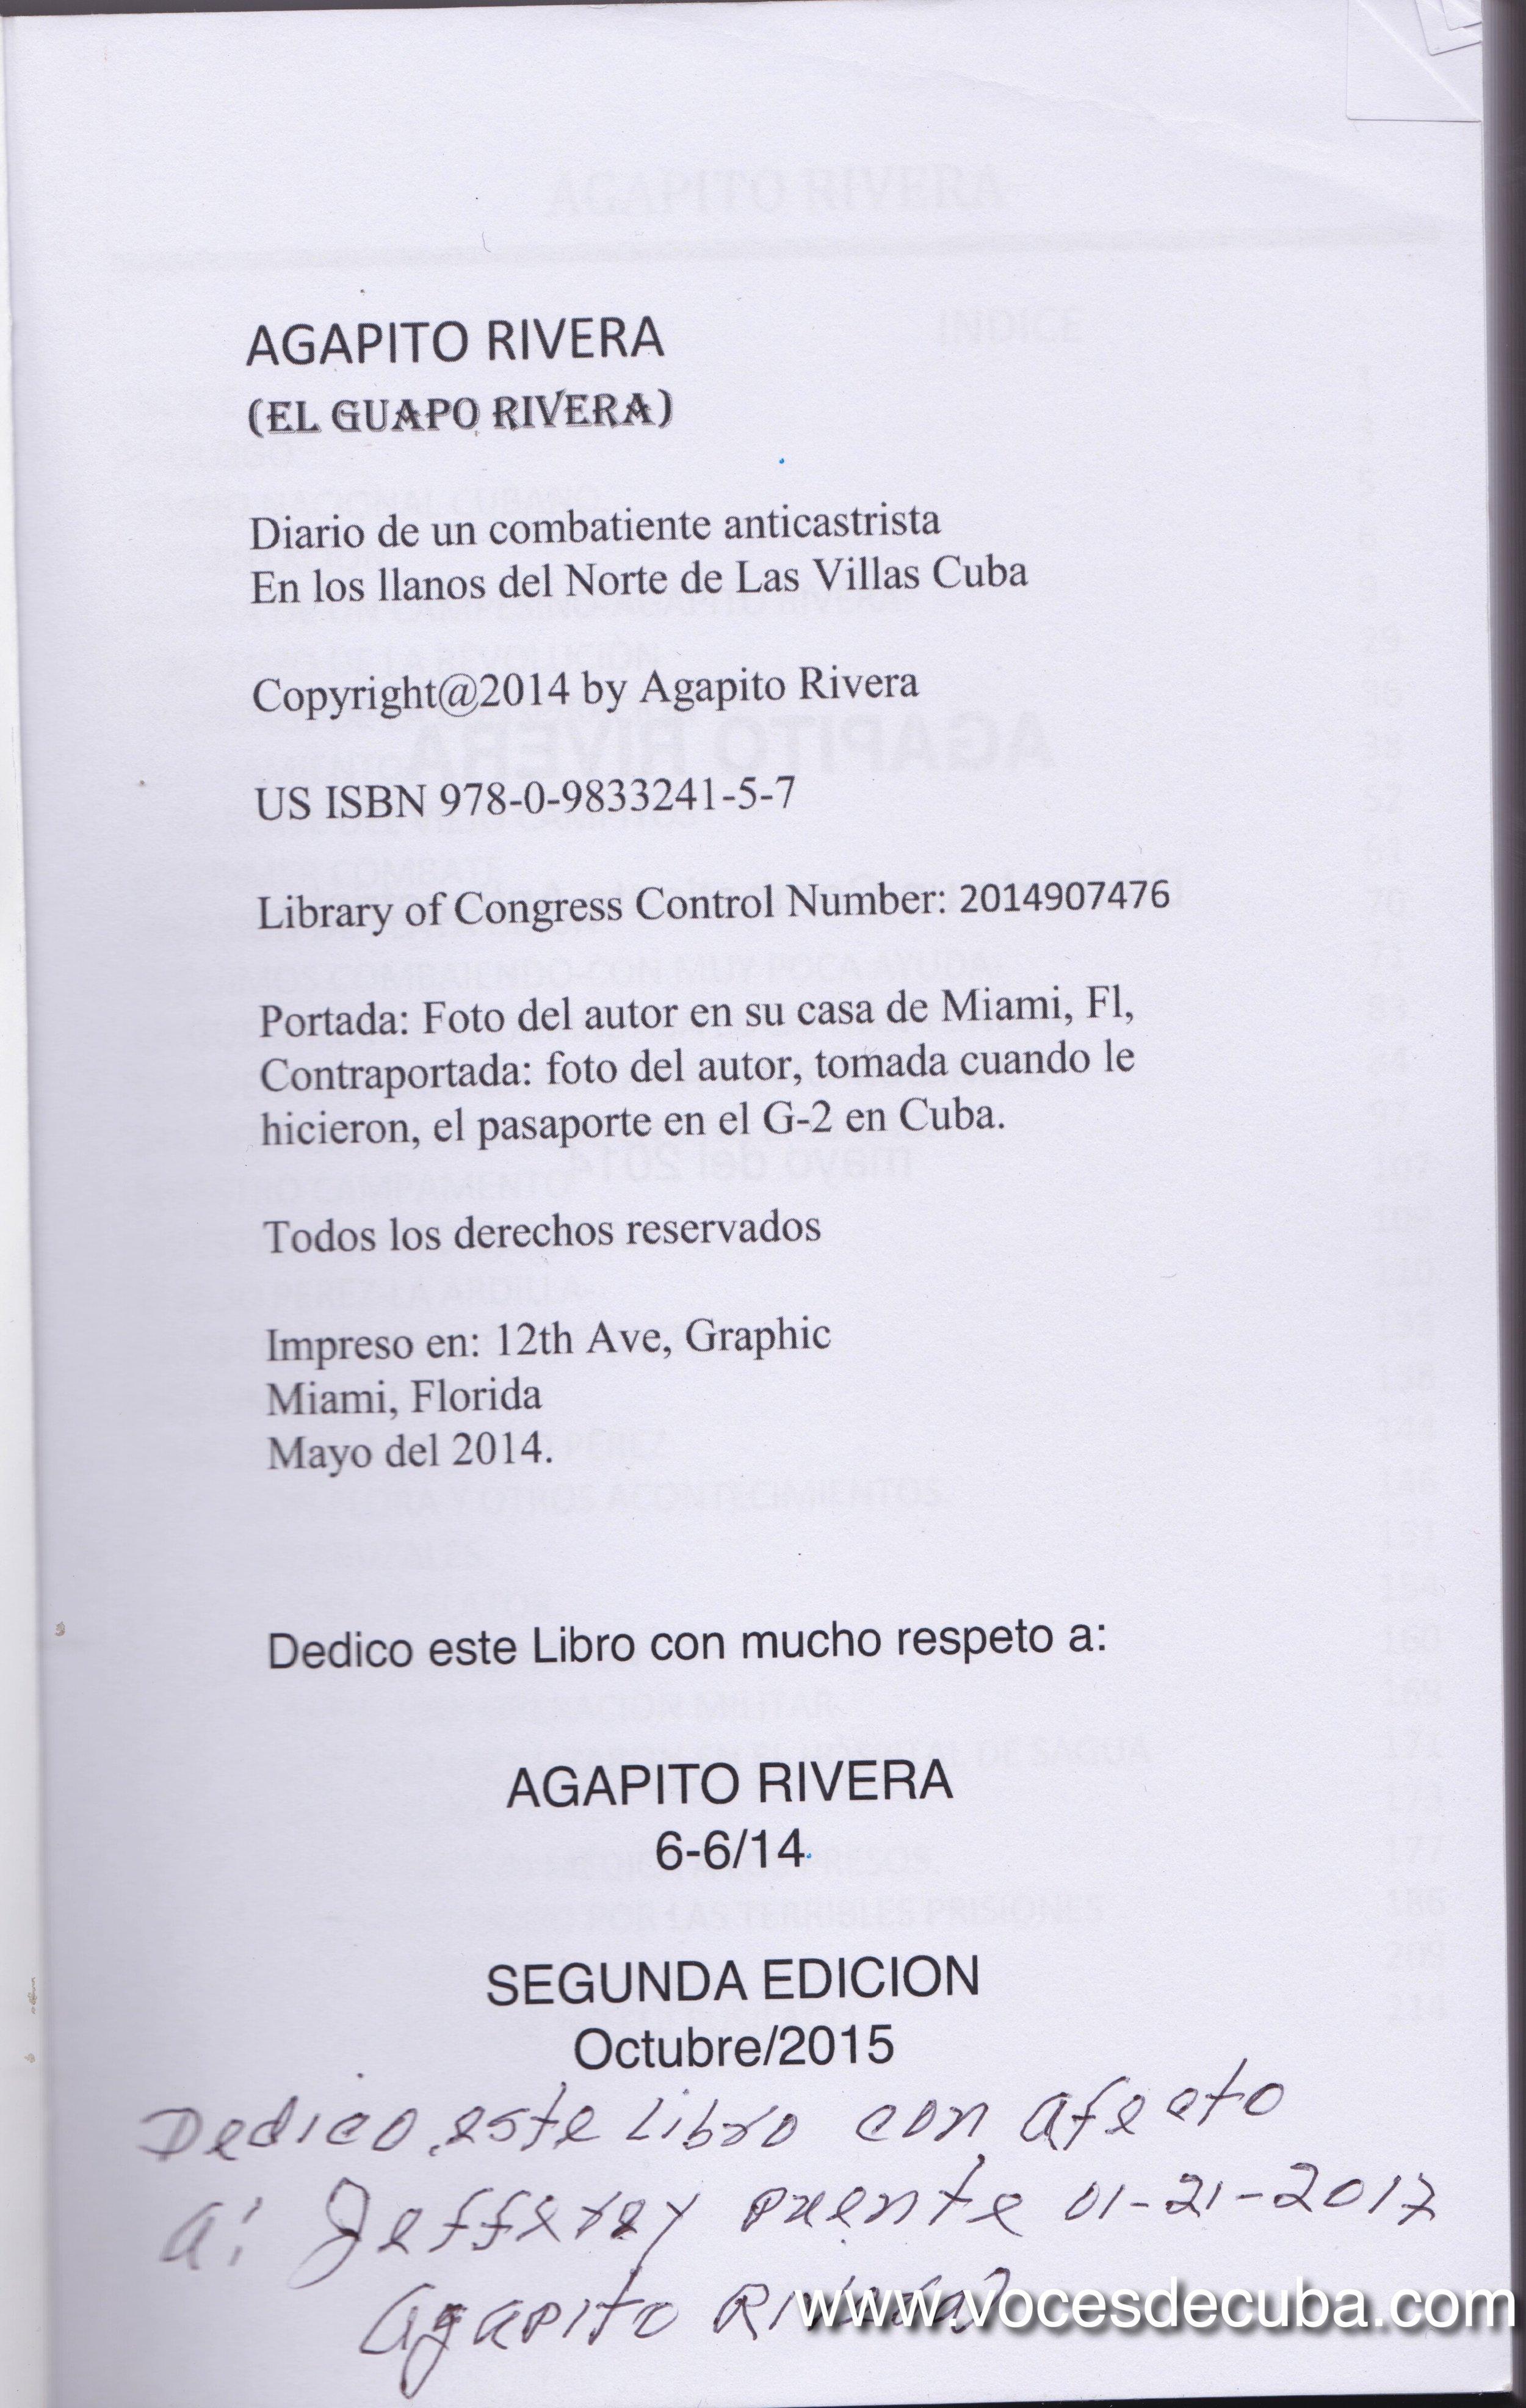 LIBRO DEDICATORIA.jpg